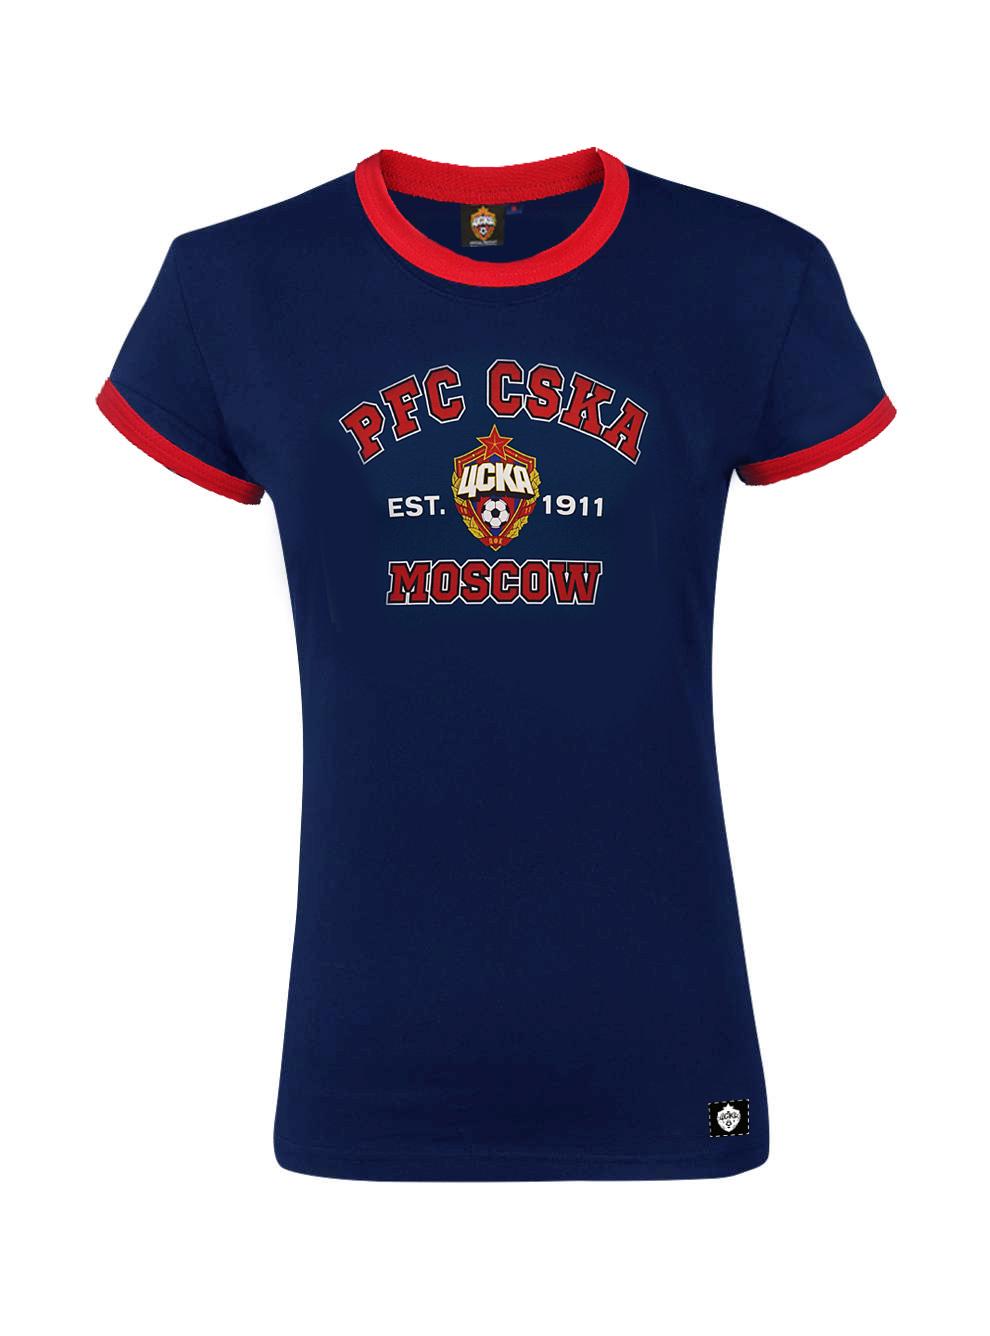 Футболка женская PFC CSKA MOSCOW, цвет тёмно-синий (L)